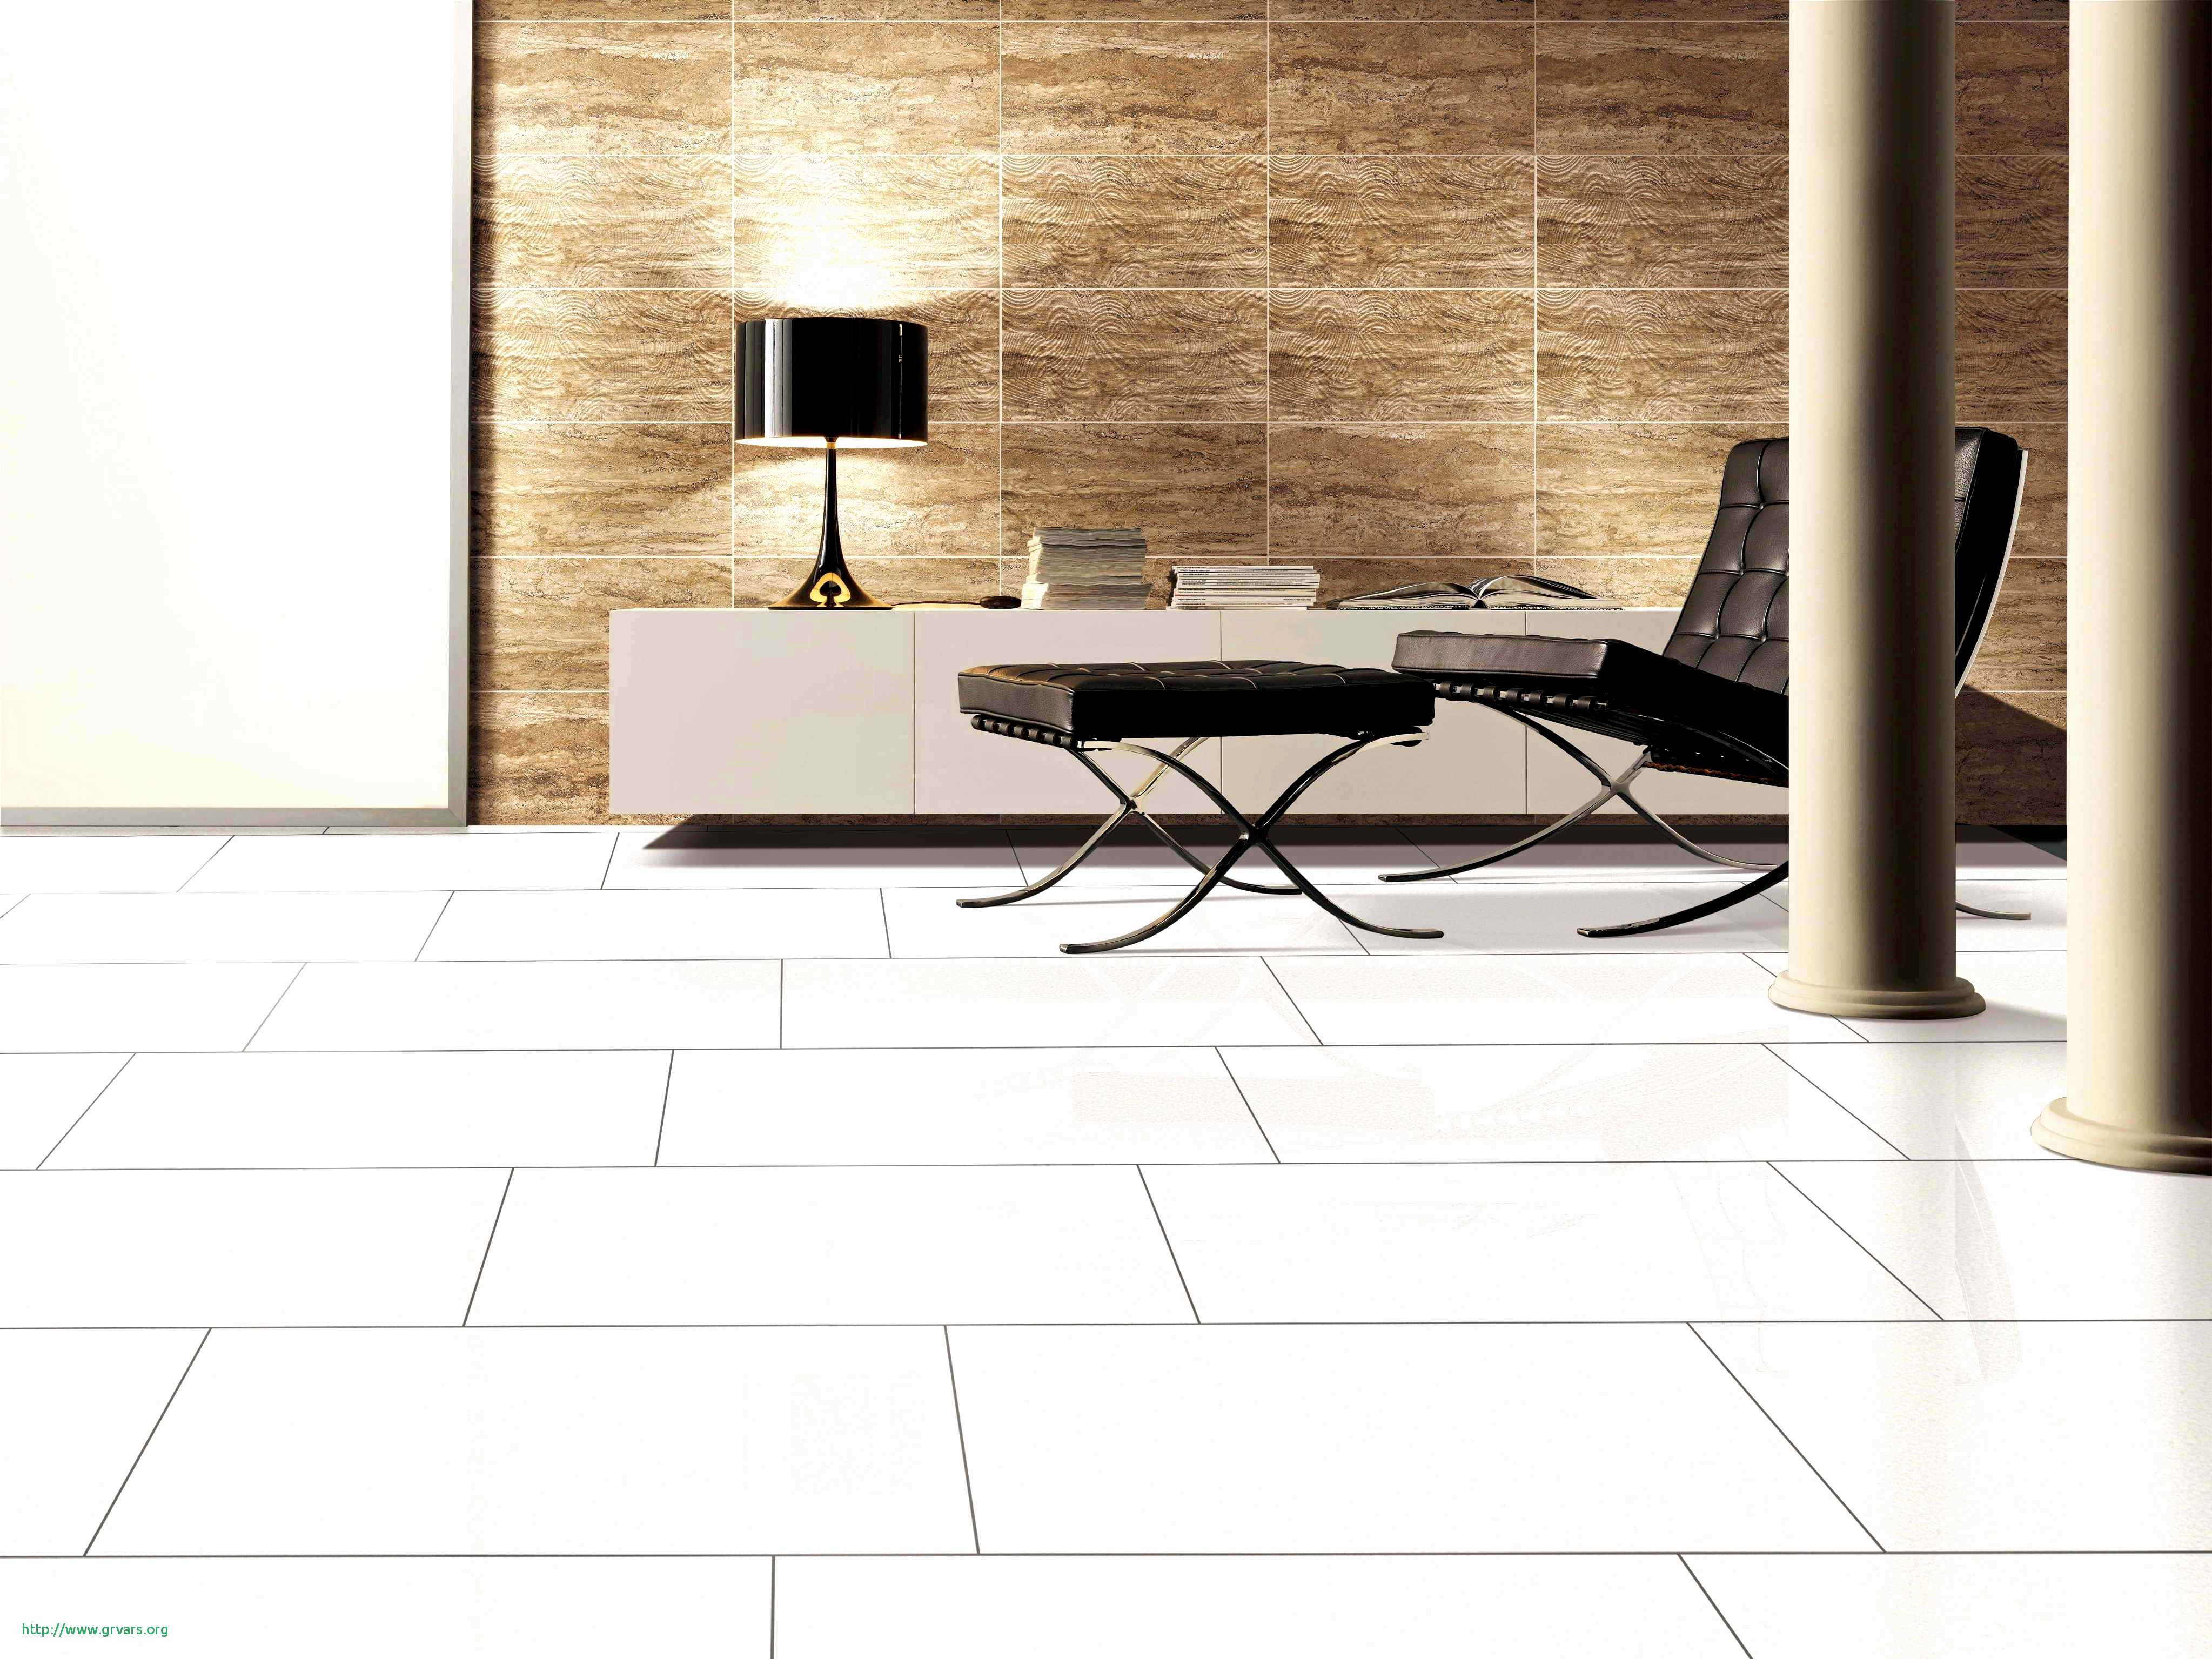 hardwood flooring franklin tn of 23 inspirant hardwood floor installation marietta ga ideas blog pertaining to wood floors luxury family all about floors luxury new new tile floor heating lovely bmw e87